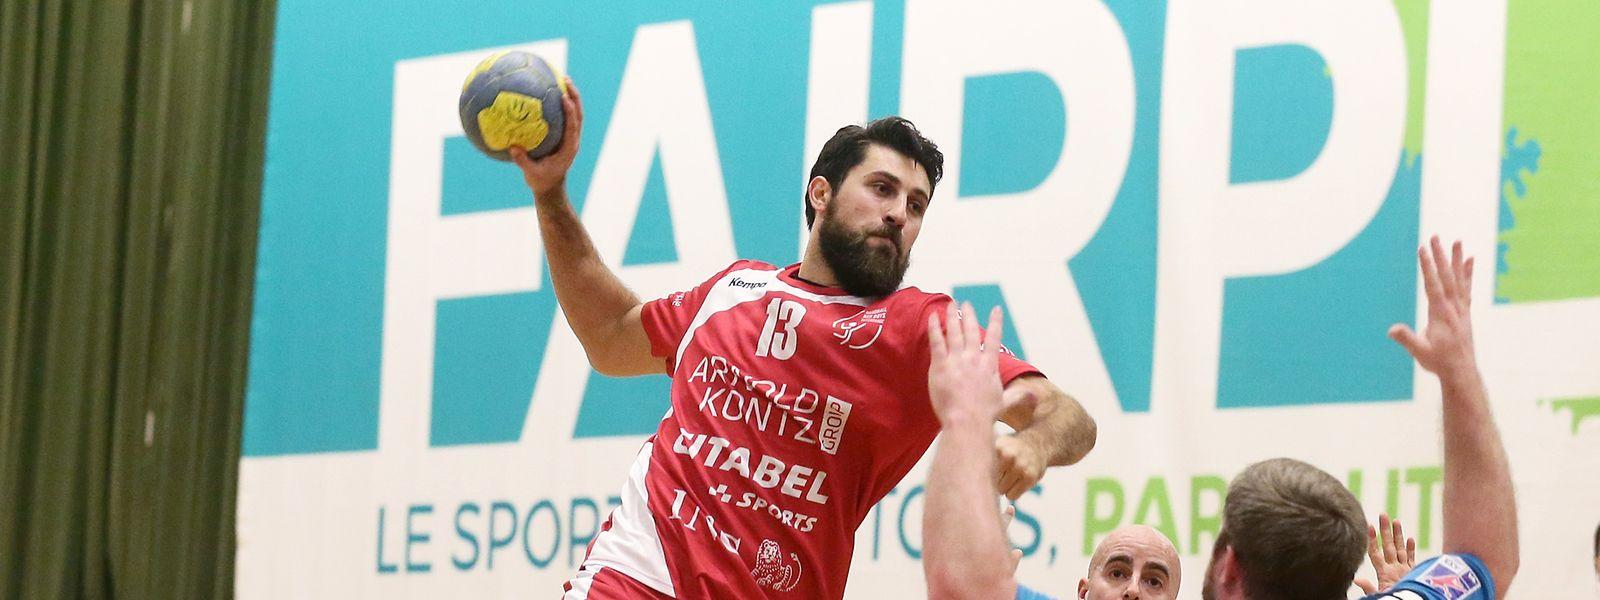 Damir Batinovic und Differdingen gewinnen gegen Käerjeng.